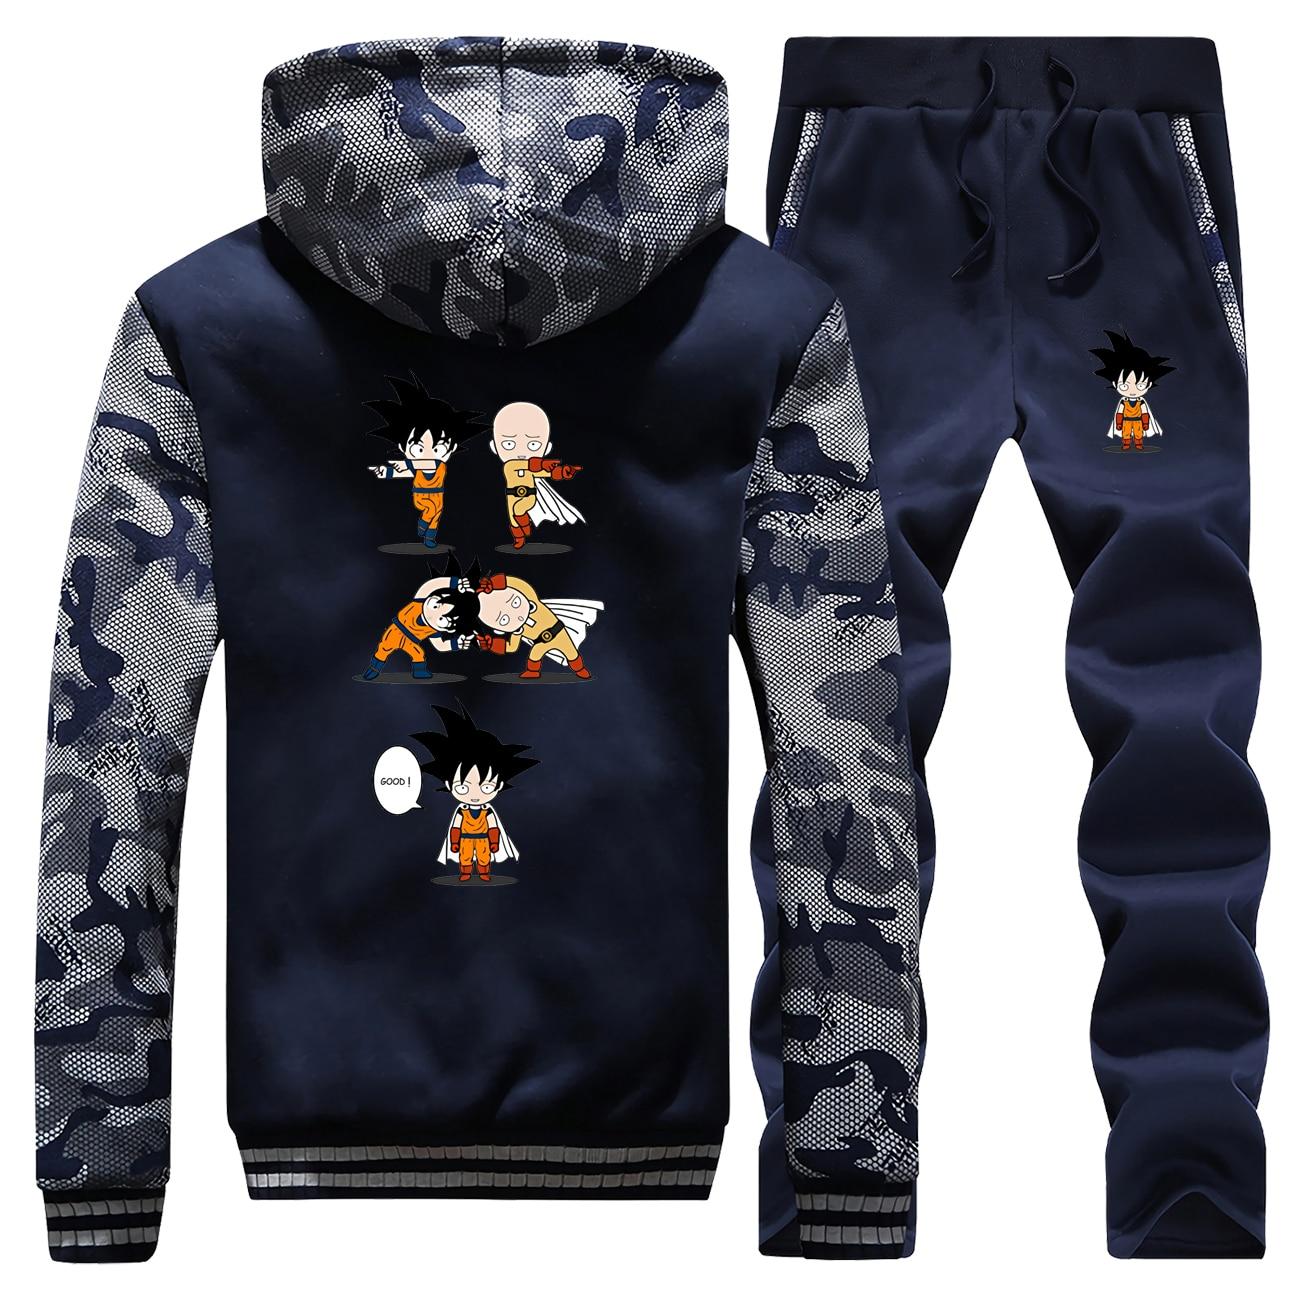 One Punch Man Saitama Jacket Pants Set Winter Men One Punch Man Saitama Hoodies Sweatshirt Tracksuit Suit Thick Coat Sportswear